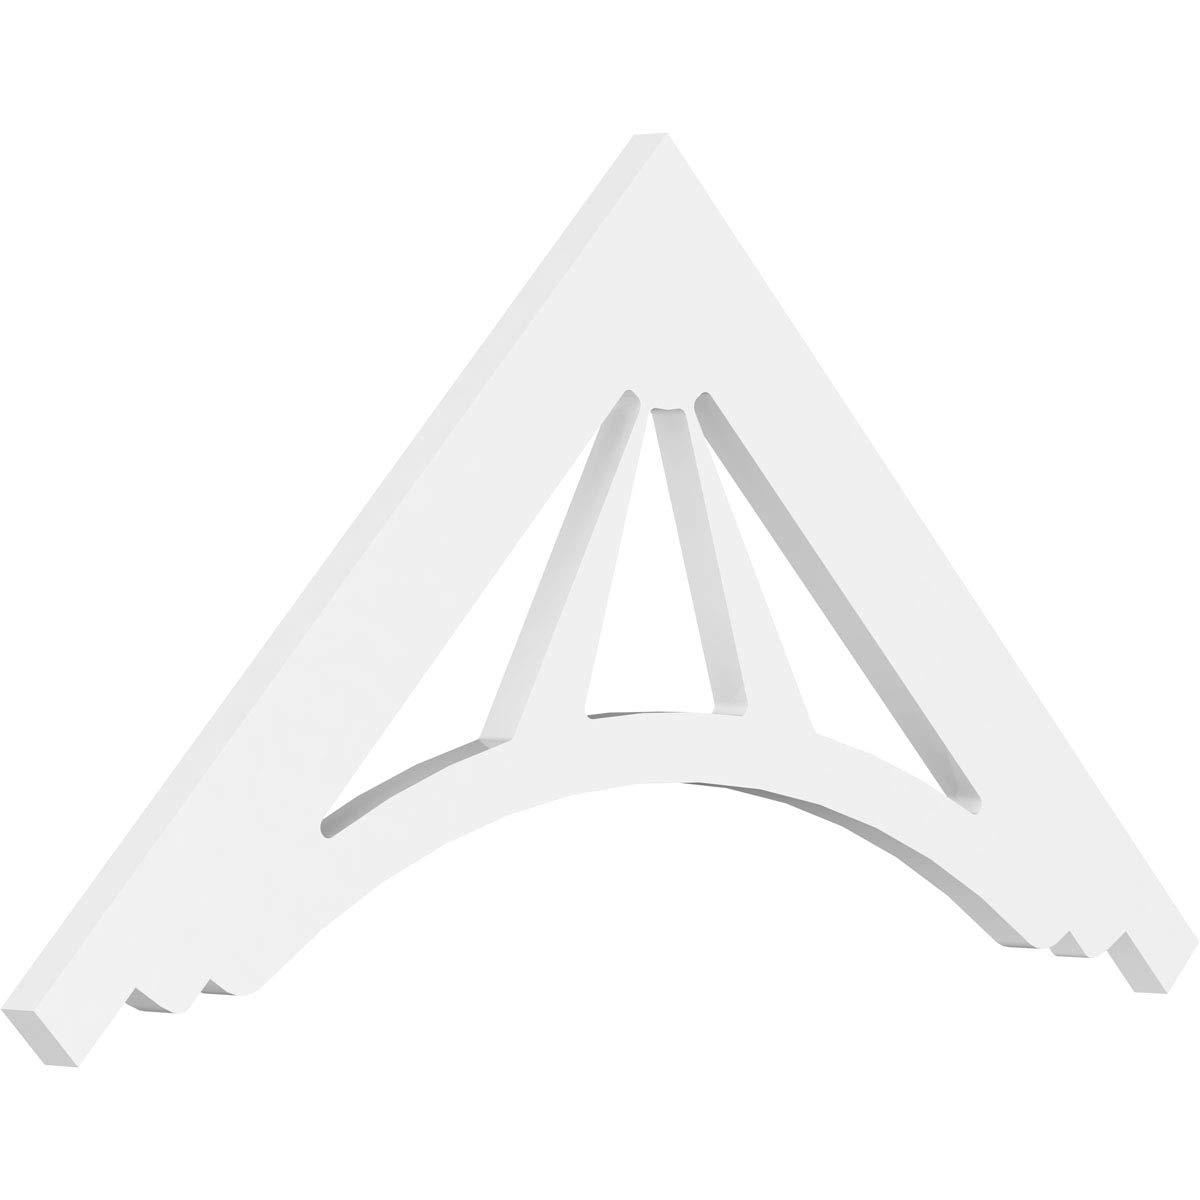 Ekena Millwork GPP036X018X100STA Gable Pediment 36''W x 18''H x 1''P (12/12) Pitch Primed